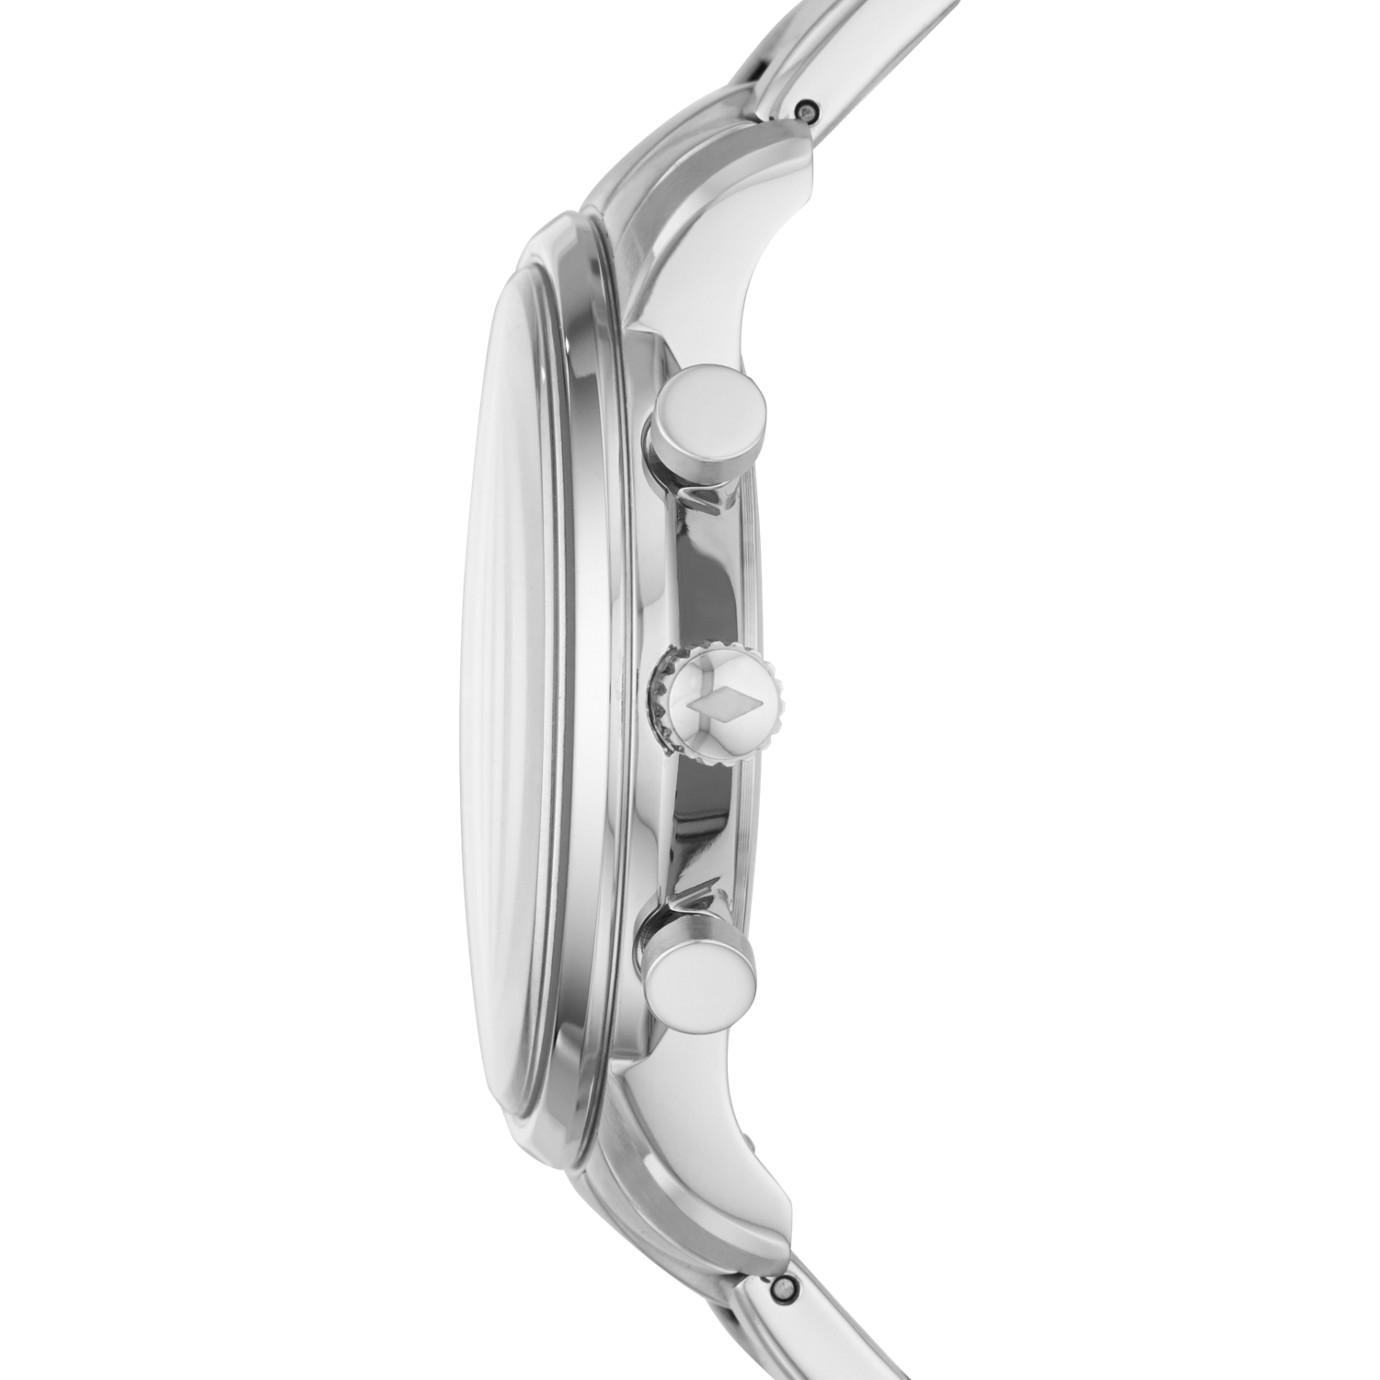 Goodwin Chronogragh Stainless Steel Watch